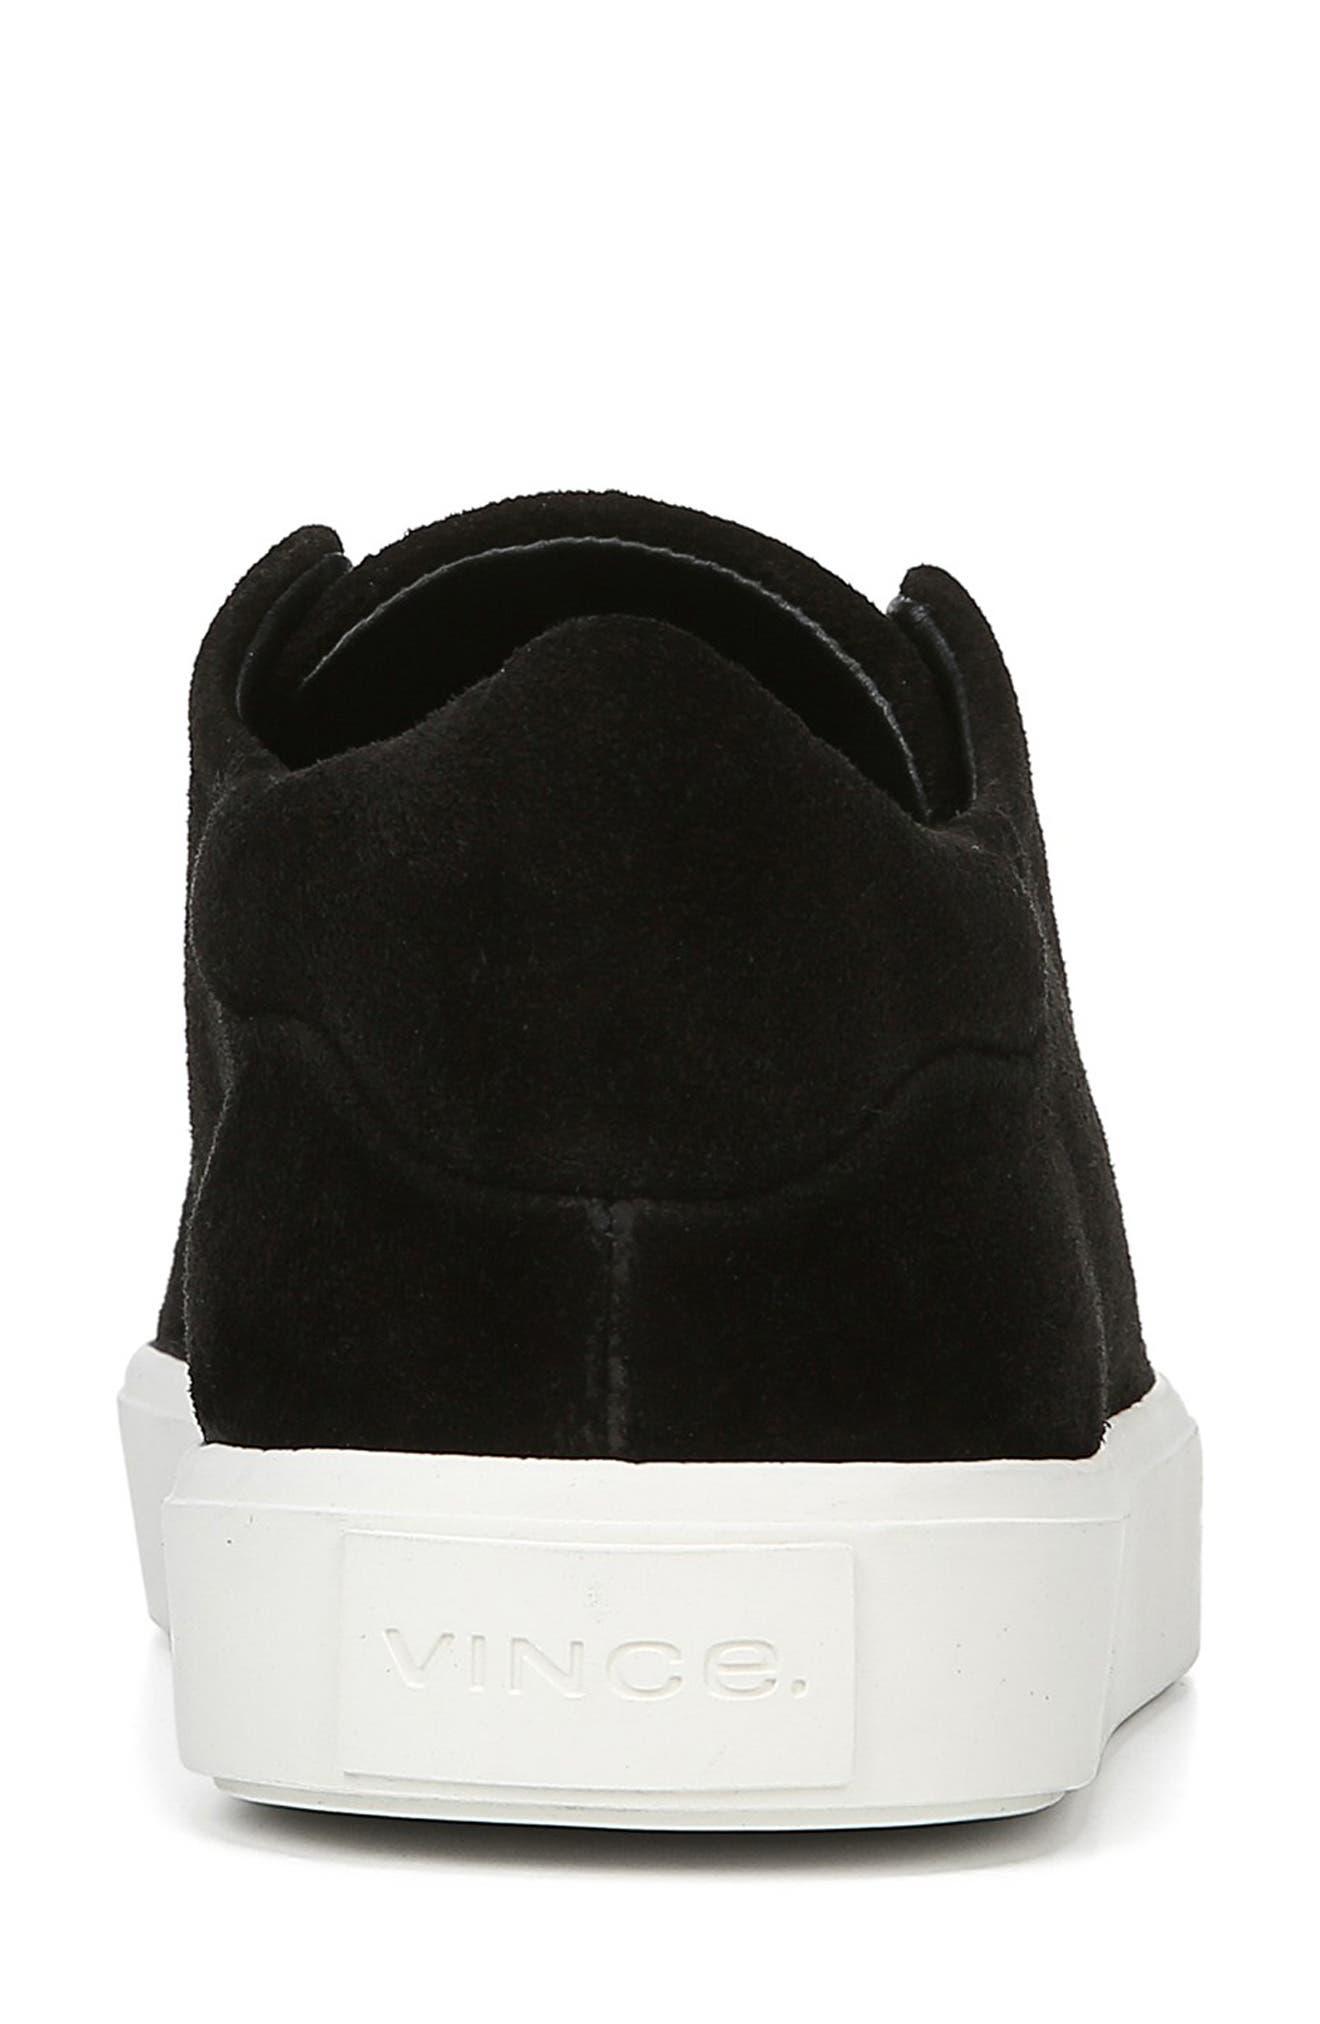 Cantara Slip-On Sneaker,                             Alternate thumbnail 7, color,                             BLACK SUEDE